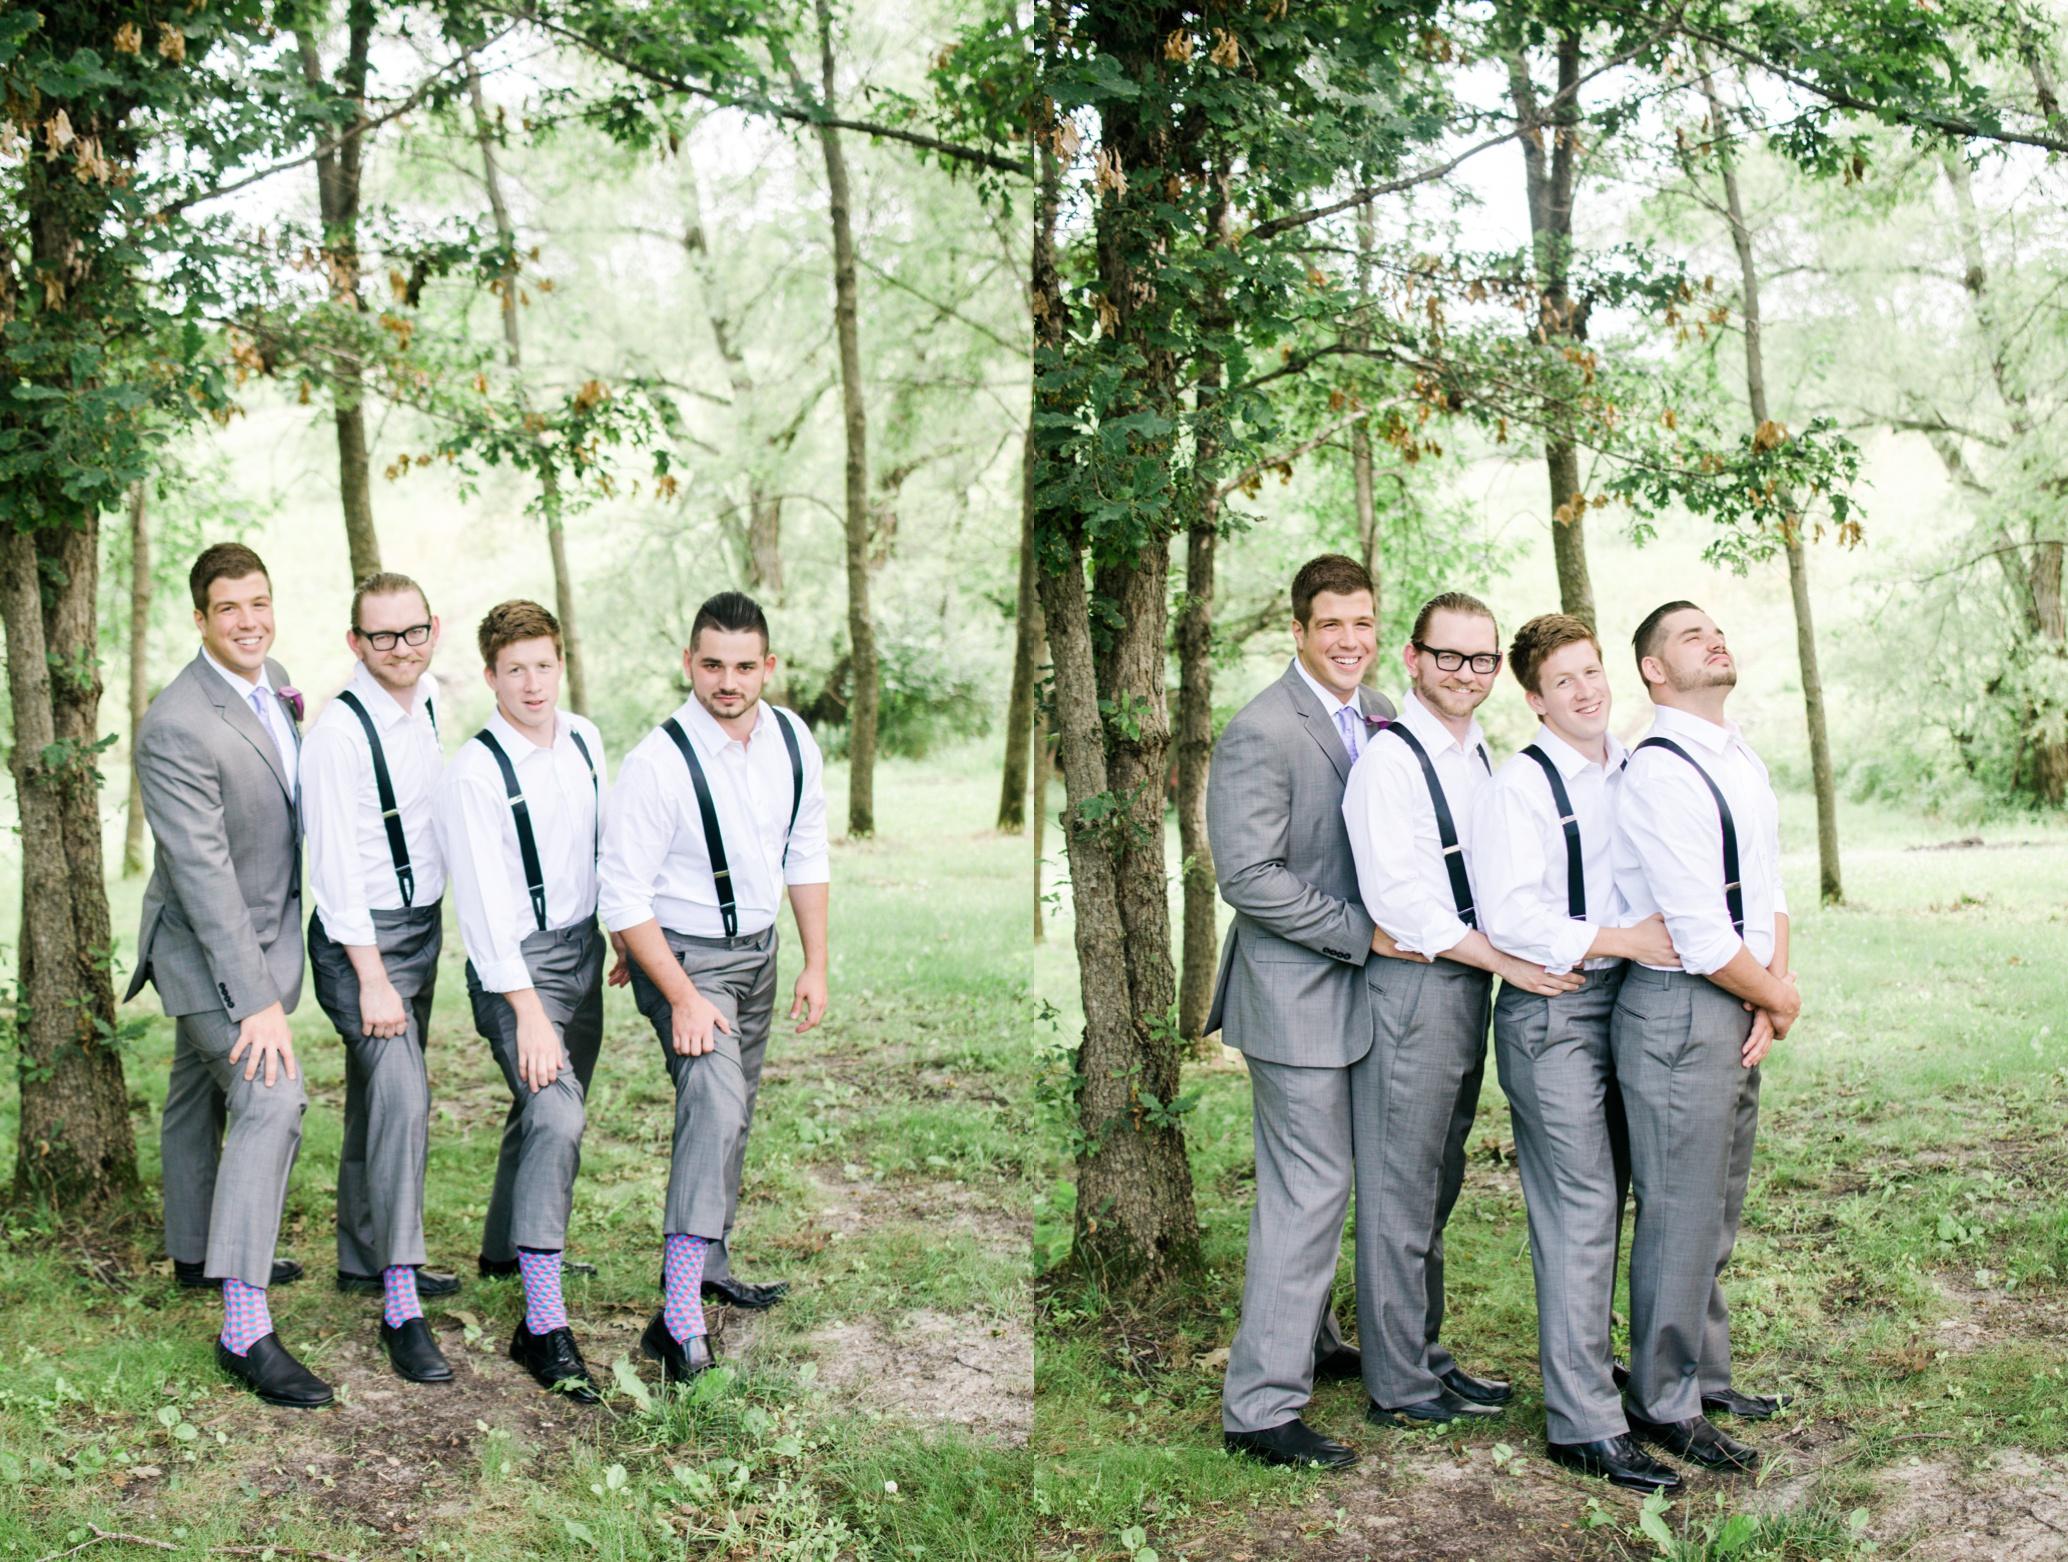 Barnes' Place Rustic Outdoor Wedding | Ali Leigh Photo Minneapolis Wedding Photographer_0122.jpg